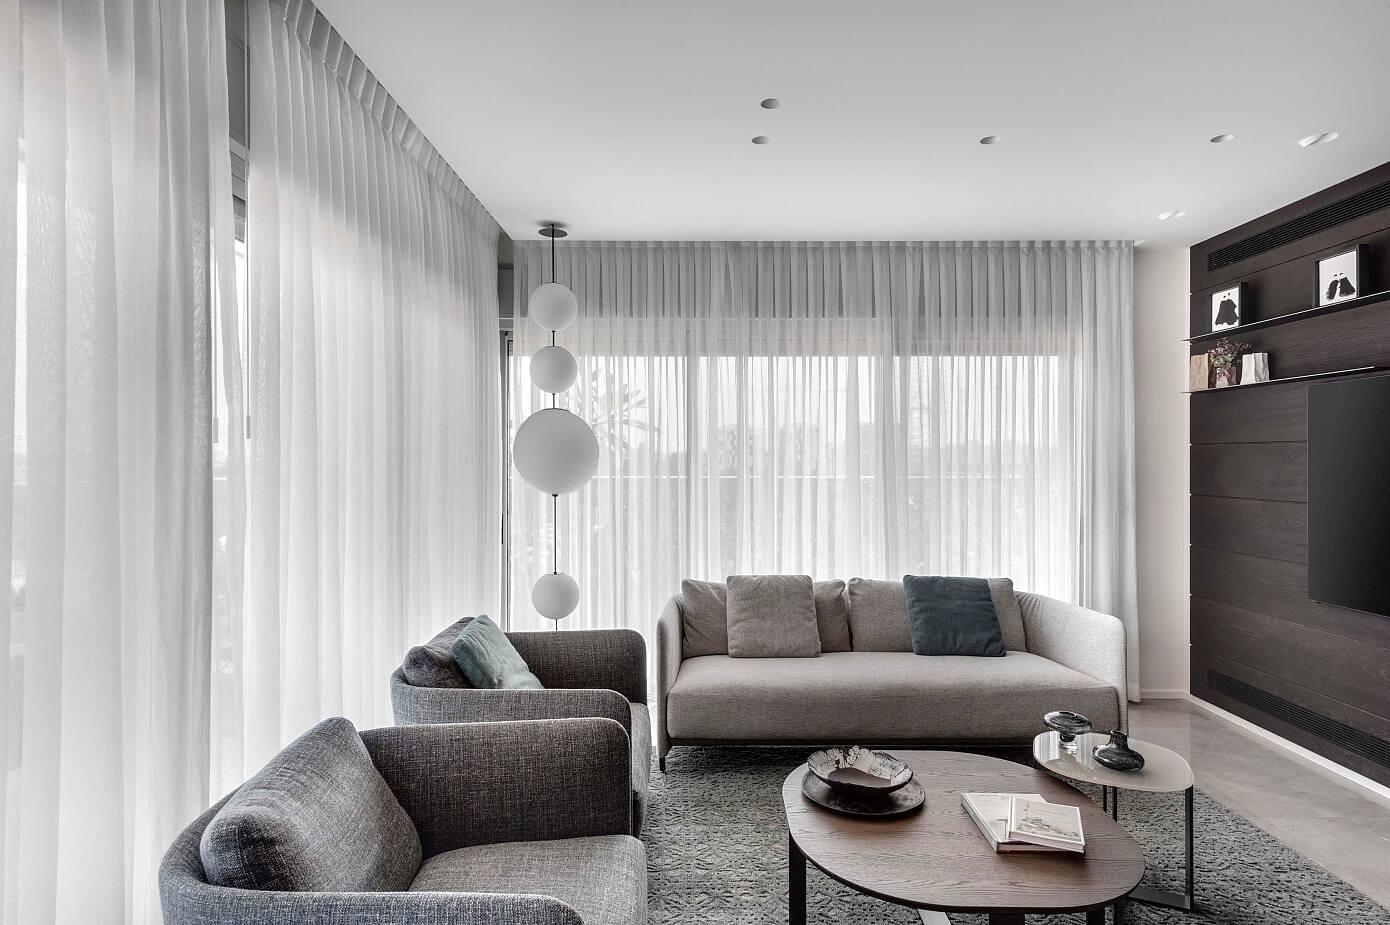 The Italian Dream Penthouse by MODY